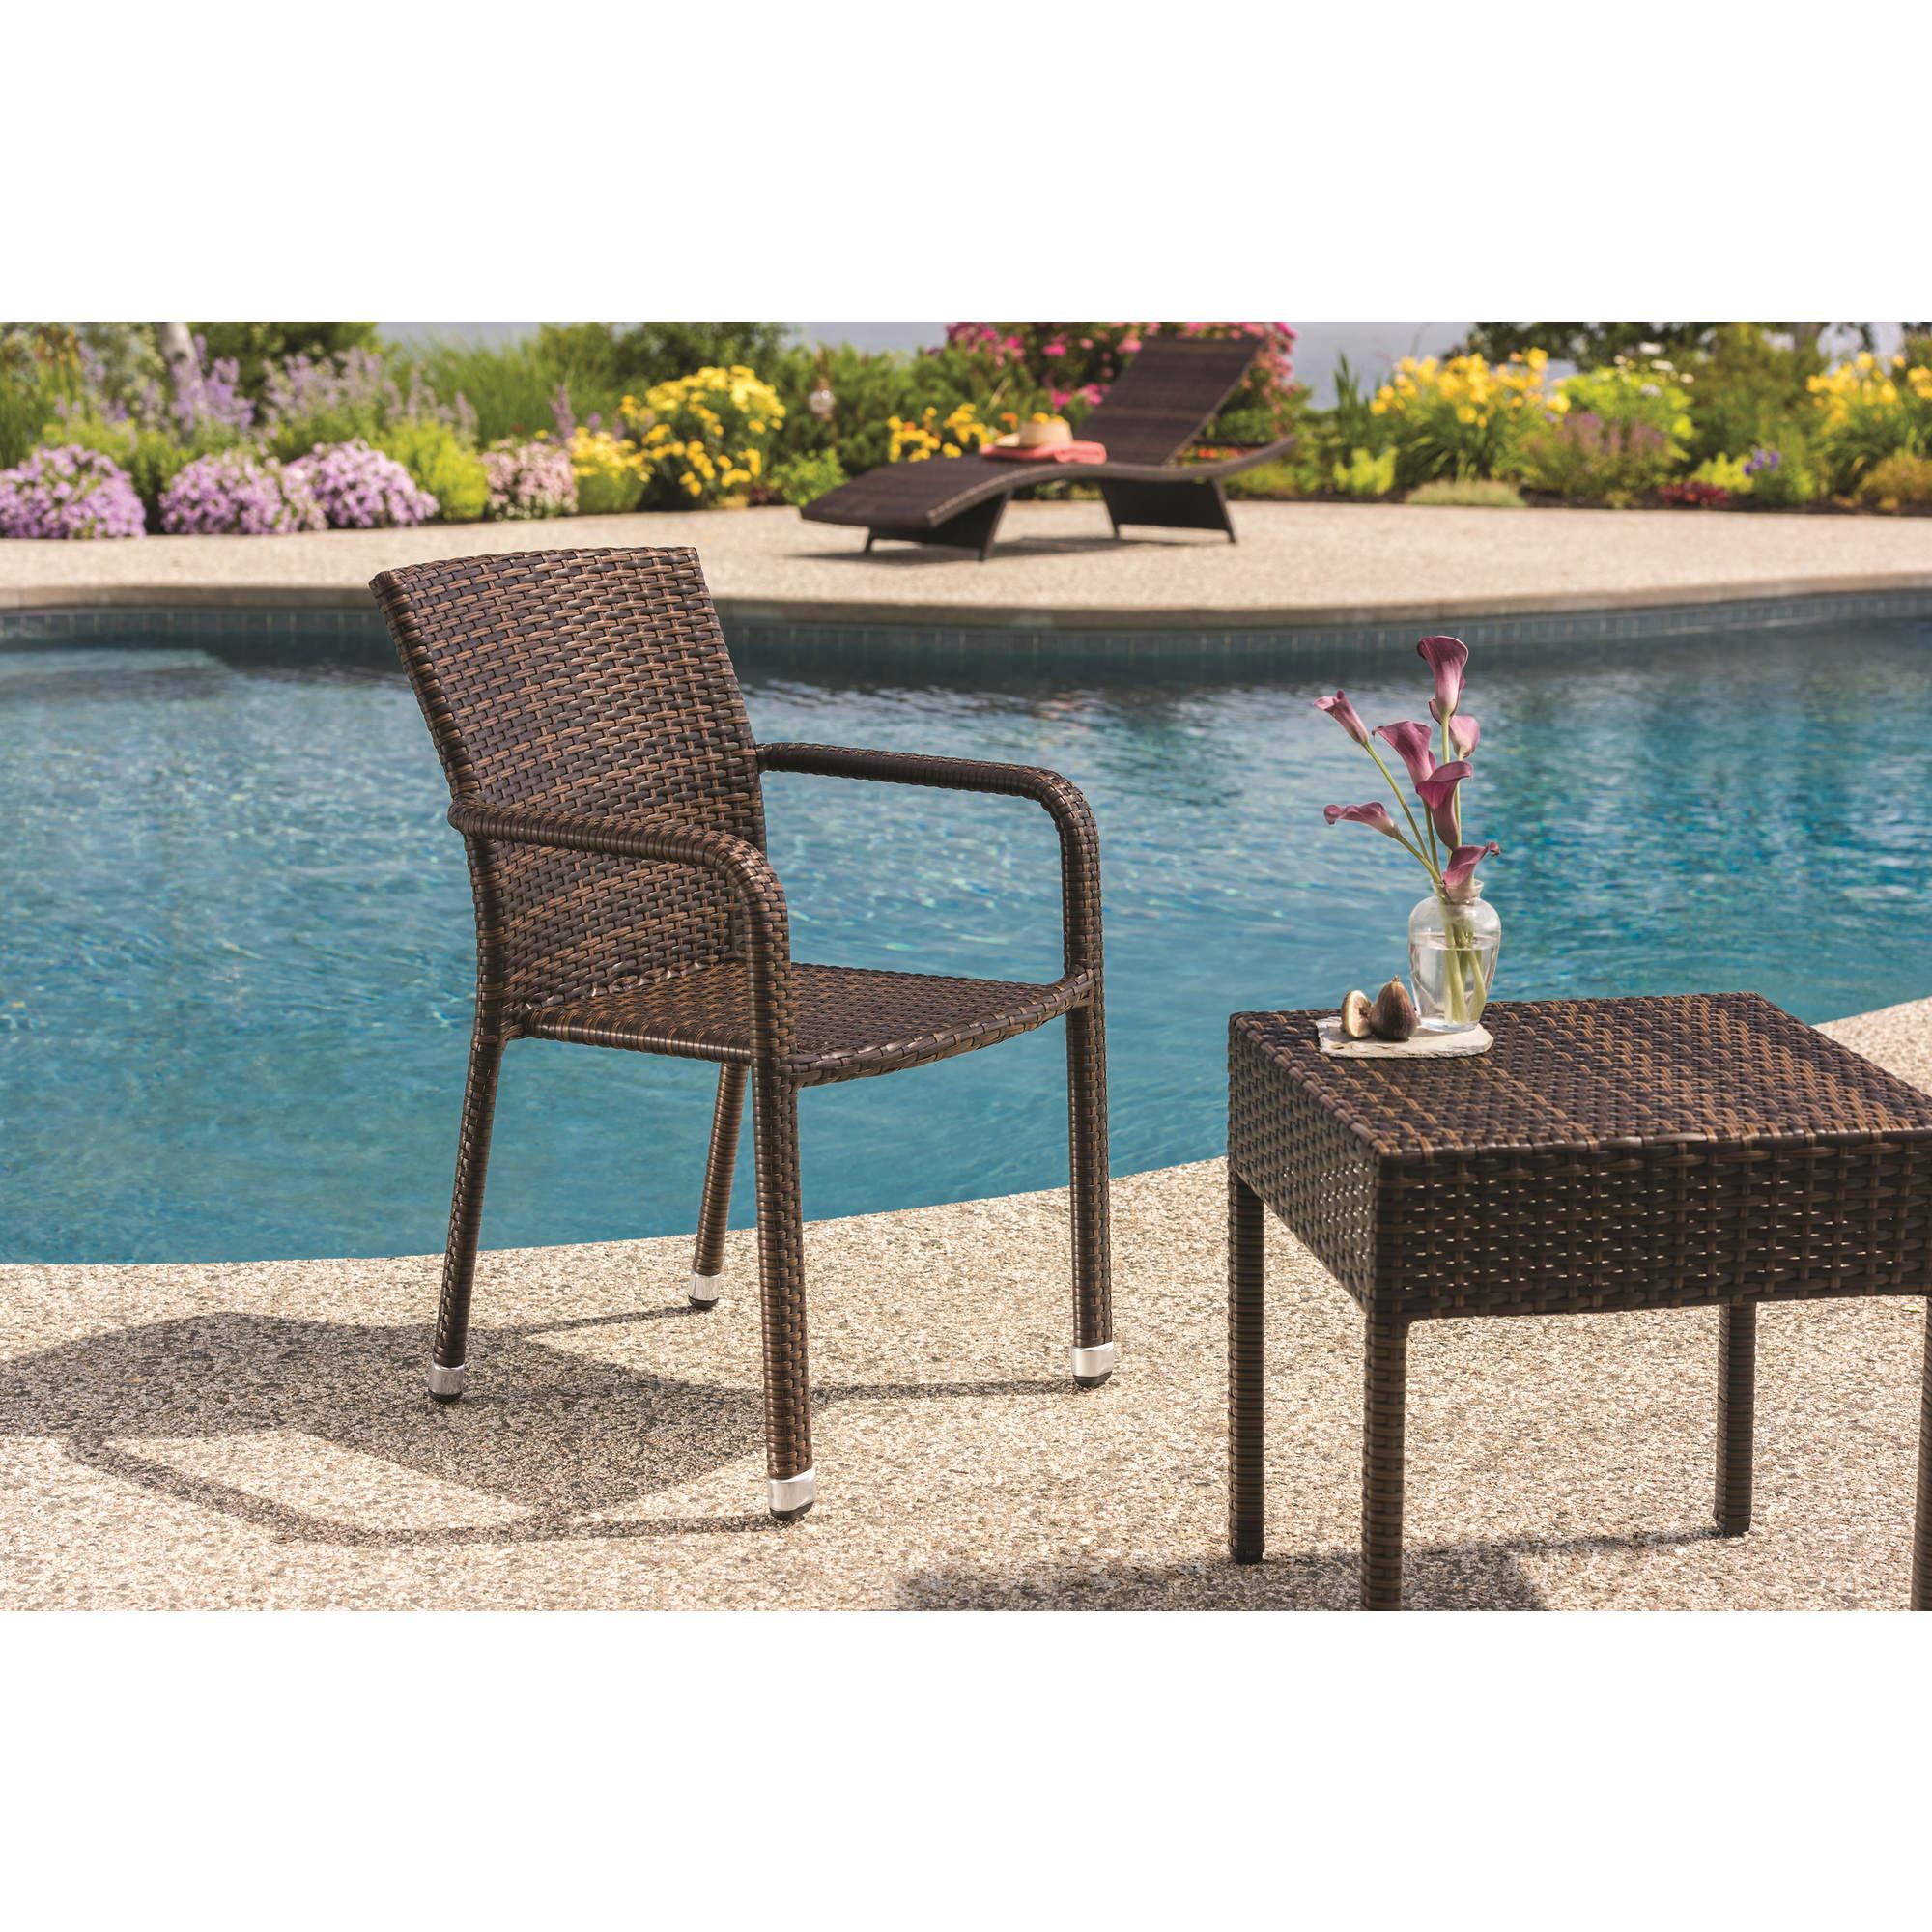 Prime Berkley Jensen Wicker Patio Stack Chair Dark Brown Cjindustries Chair Design For Home Cjindustriesco